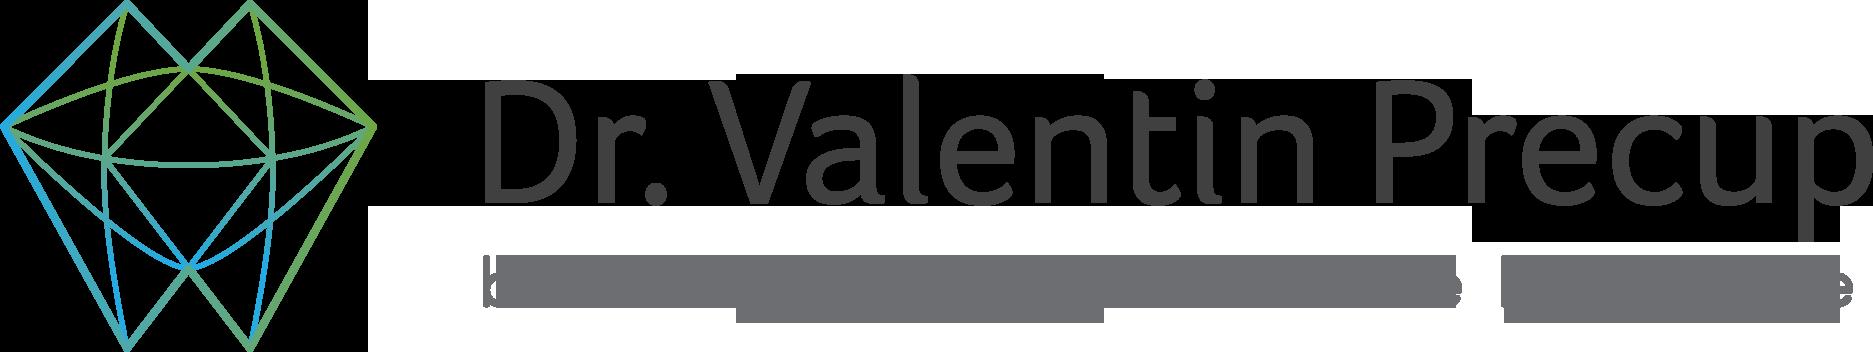 Dr Valentin Precup